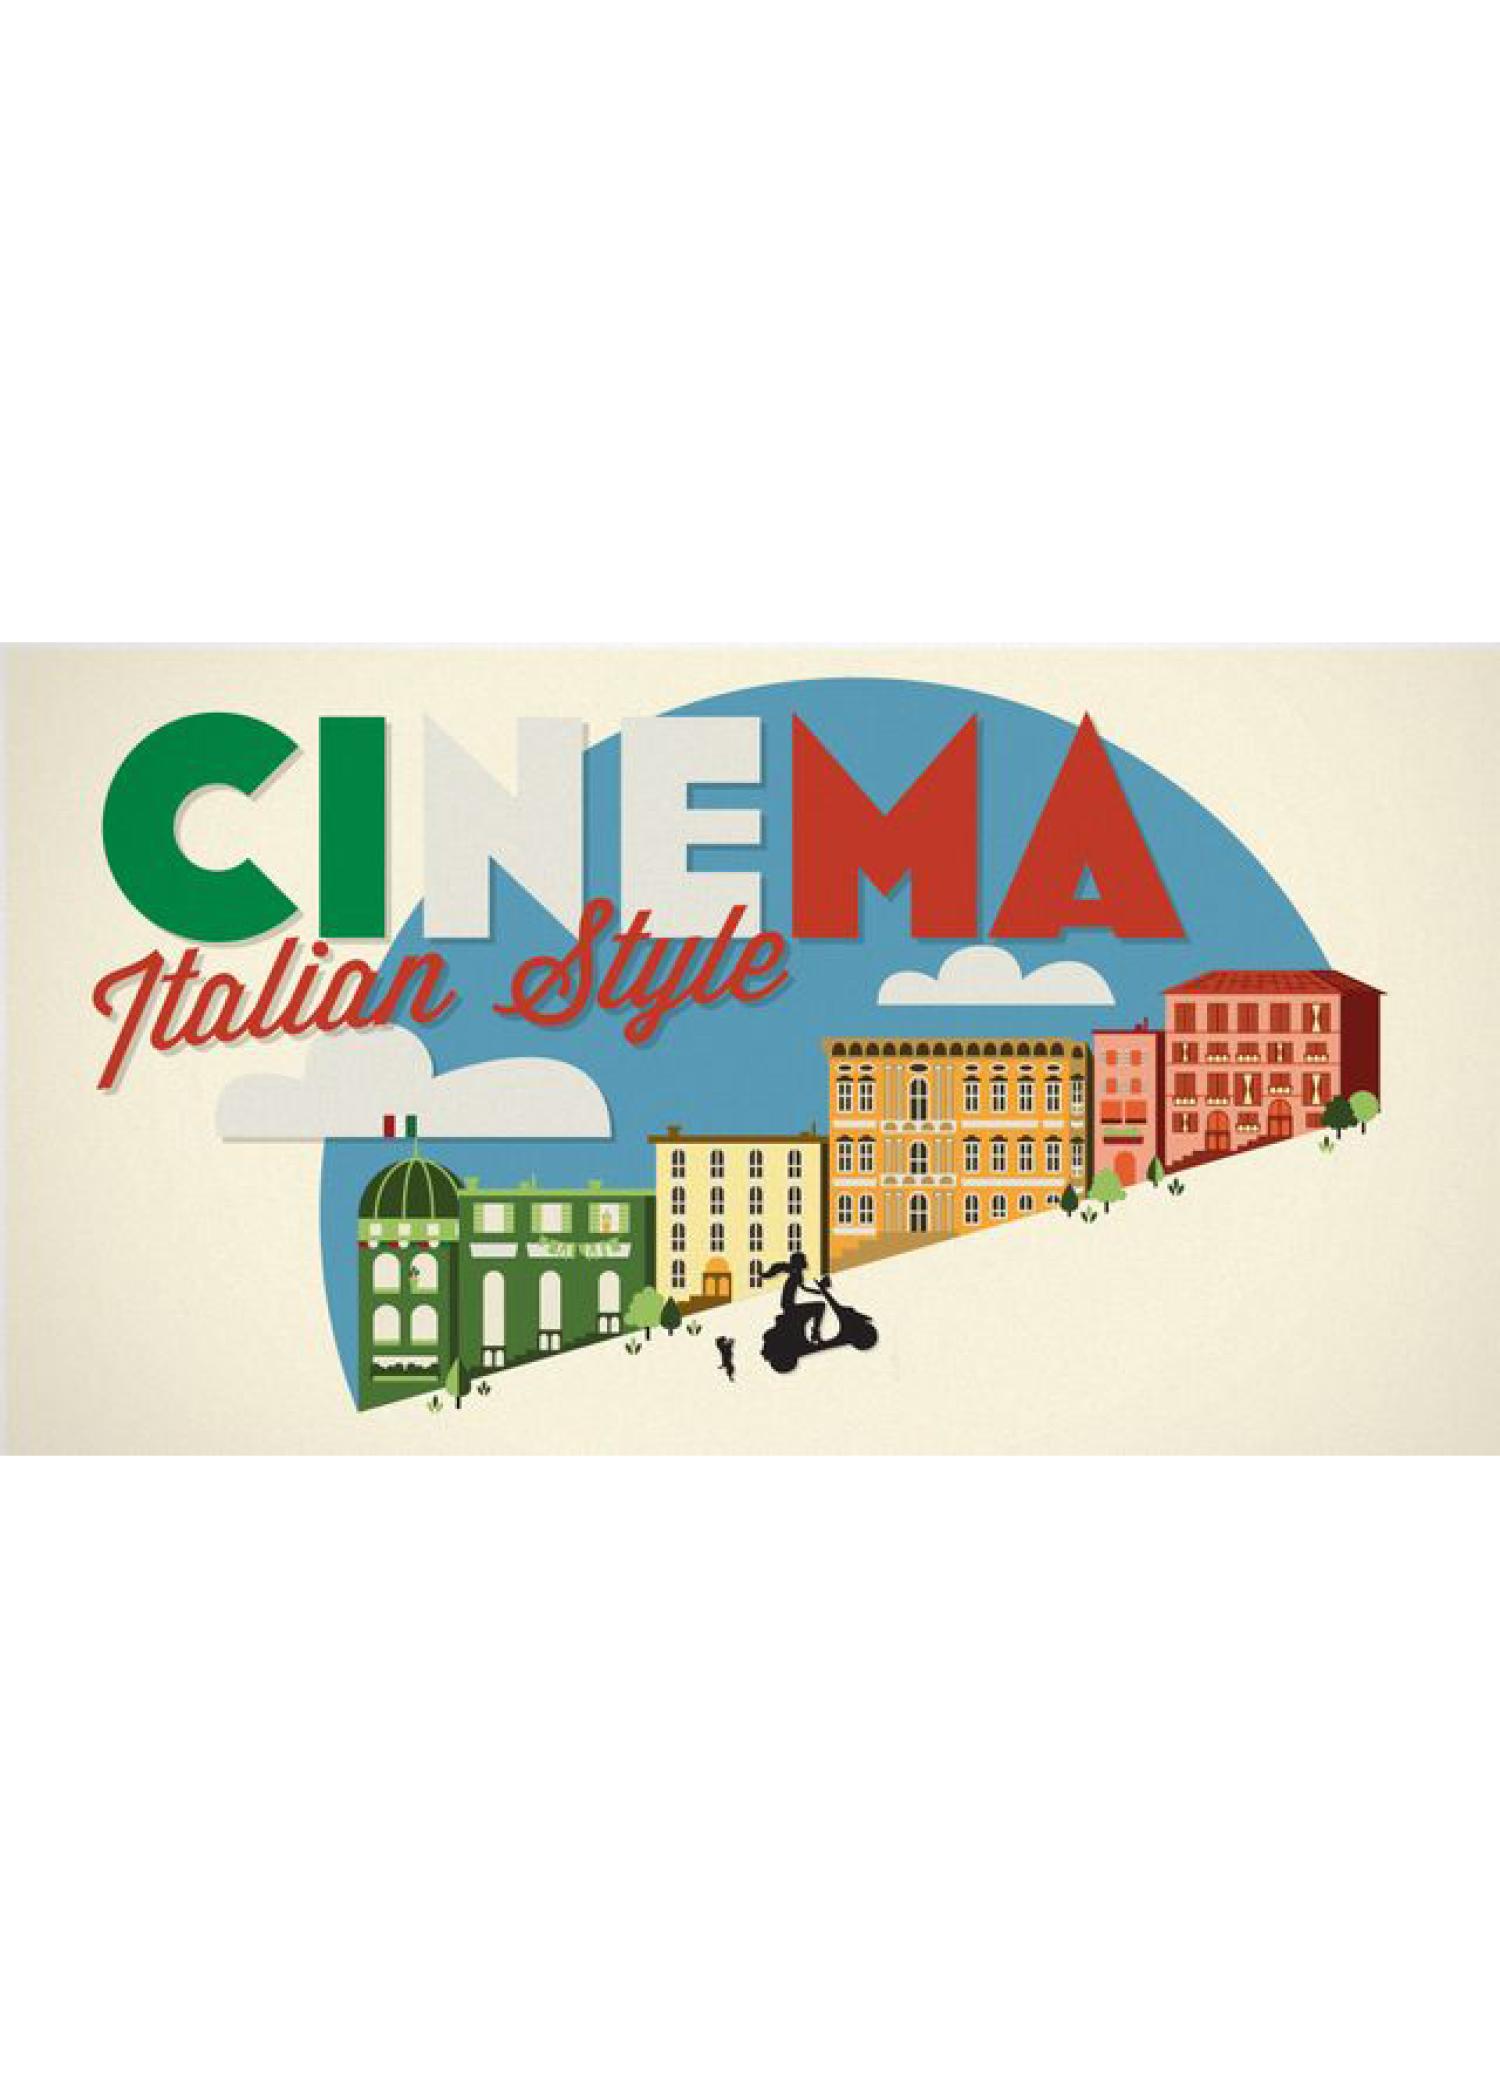 Cinema! Italian Style!